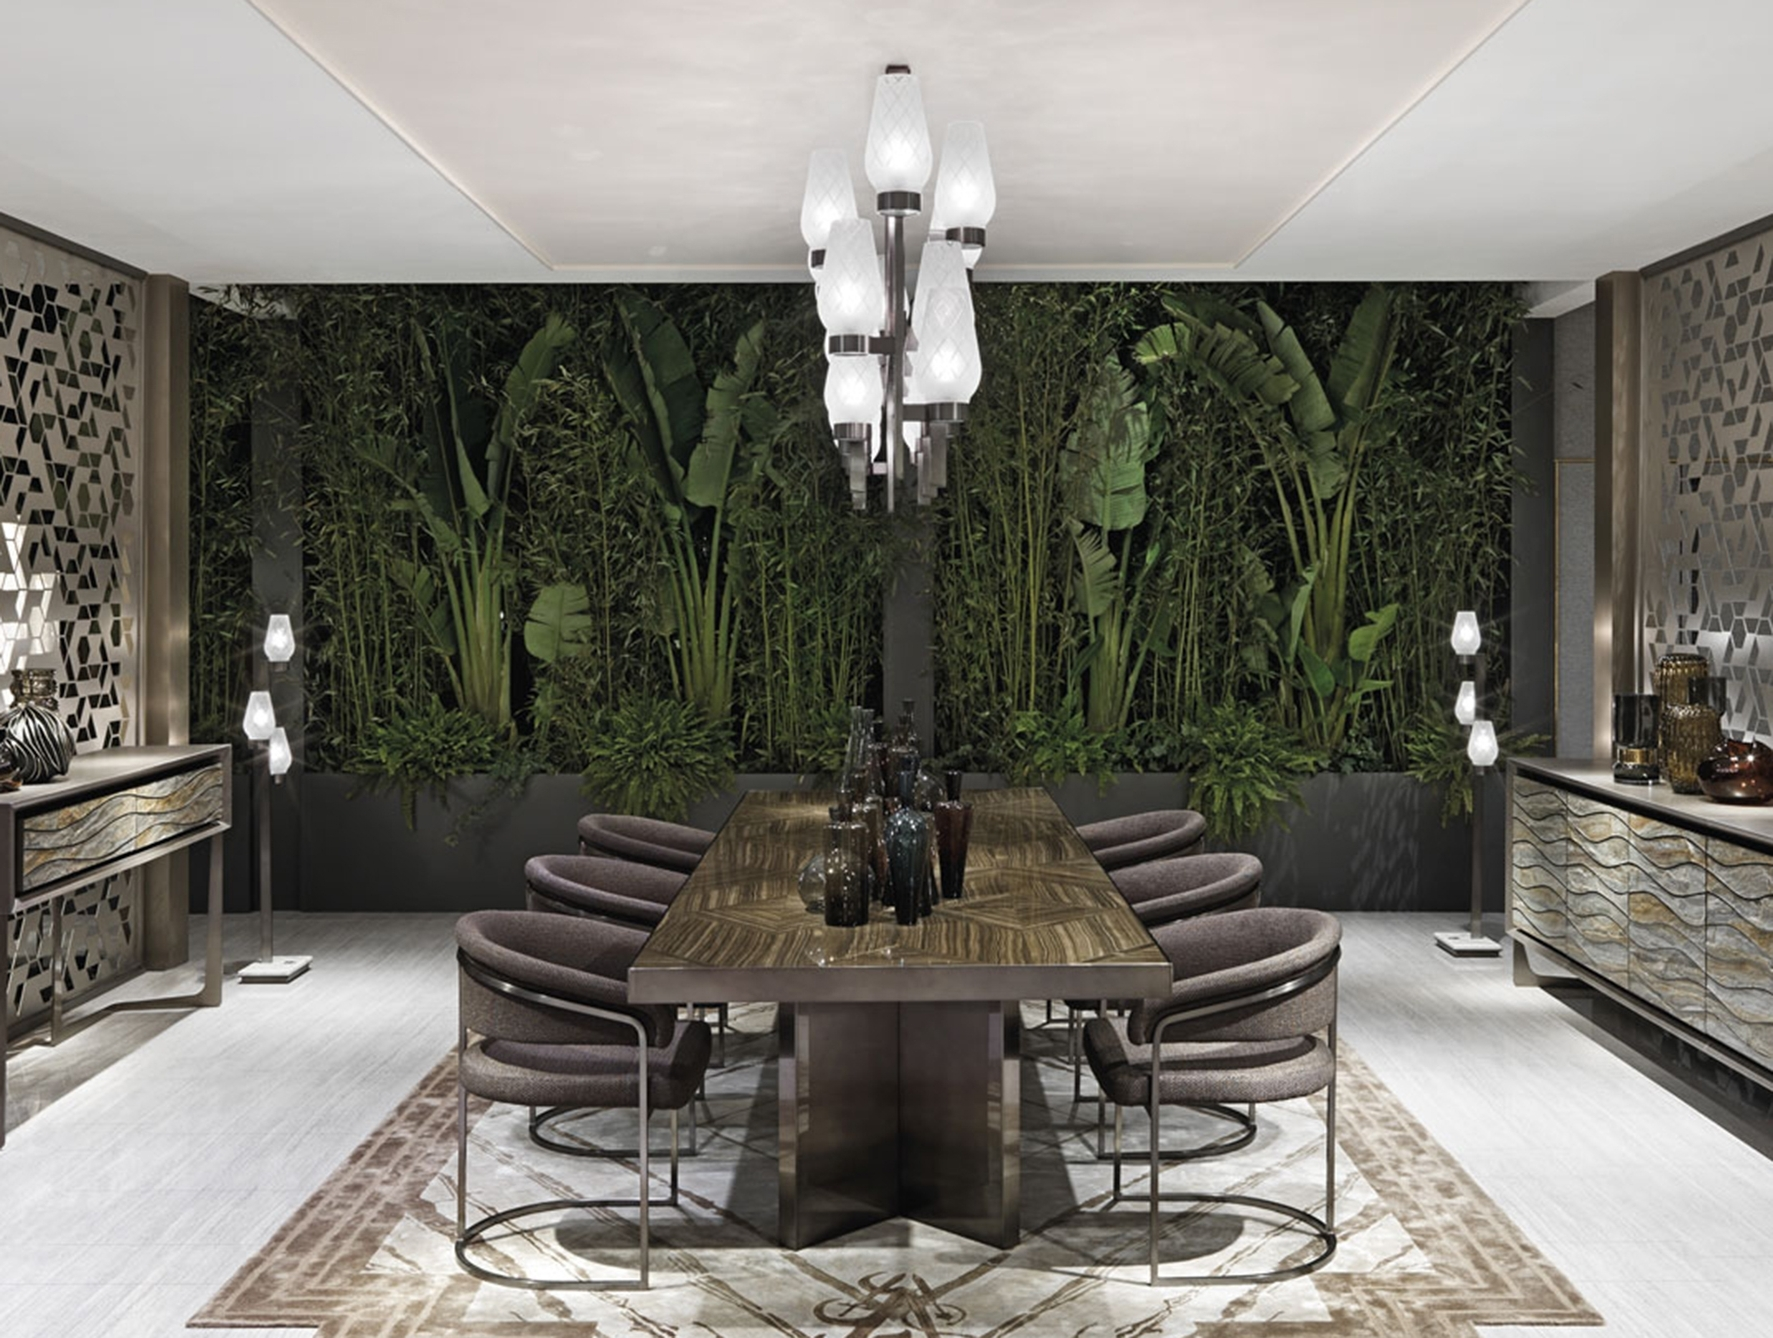 Favorite Designer Italian Dining Tables & Luxury High End Dining Tables In Italian Dining Tables (View 9 of 25)